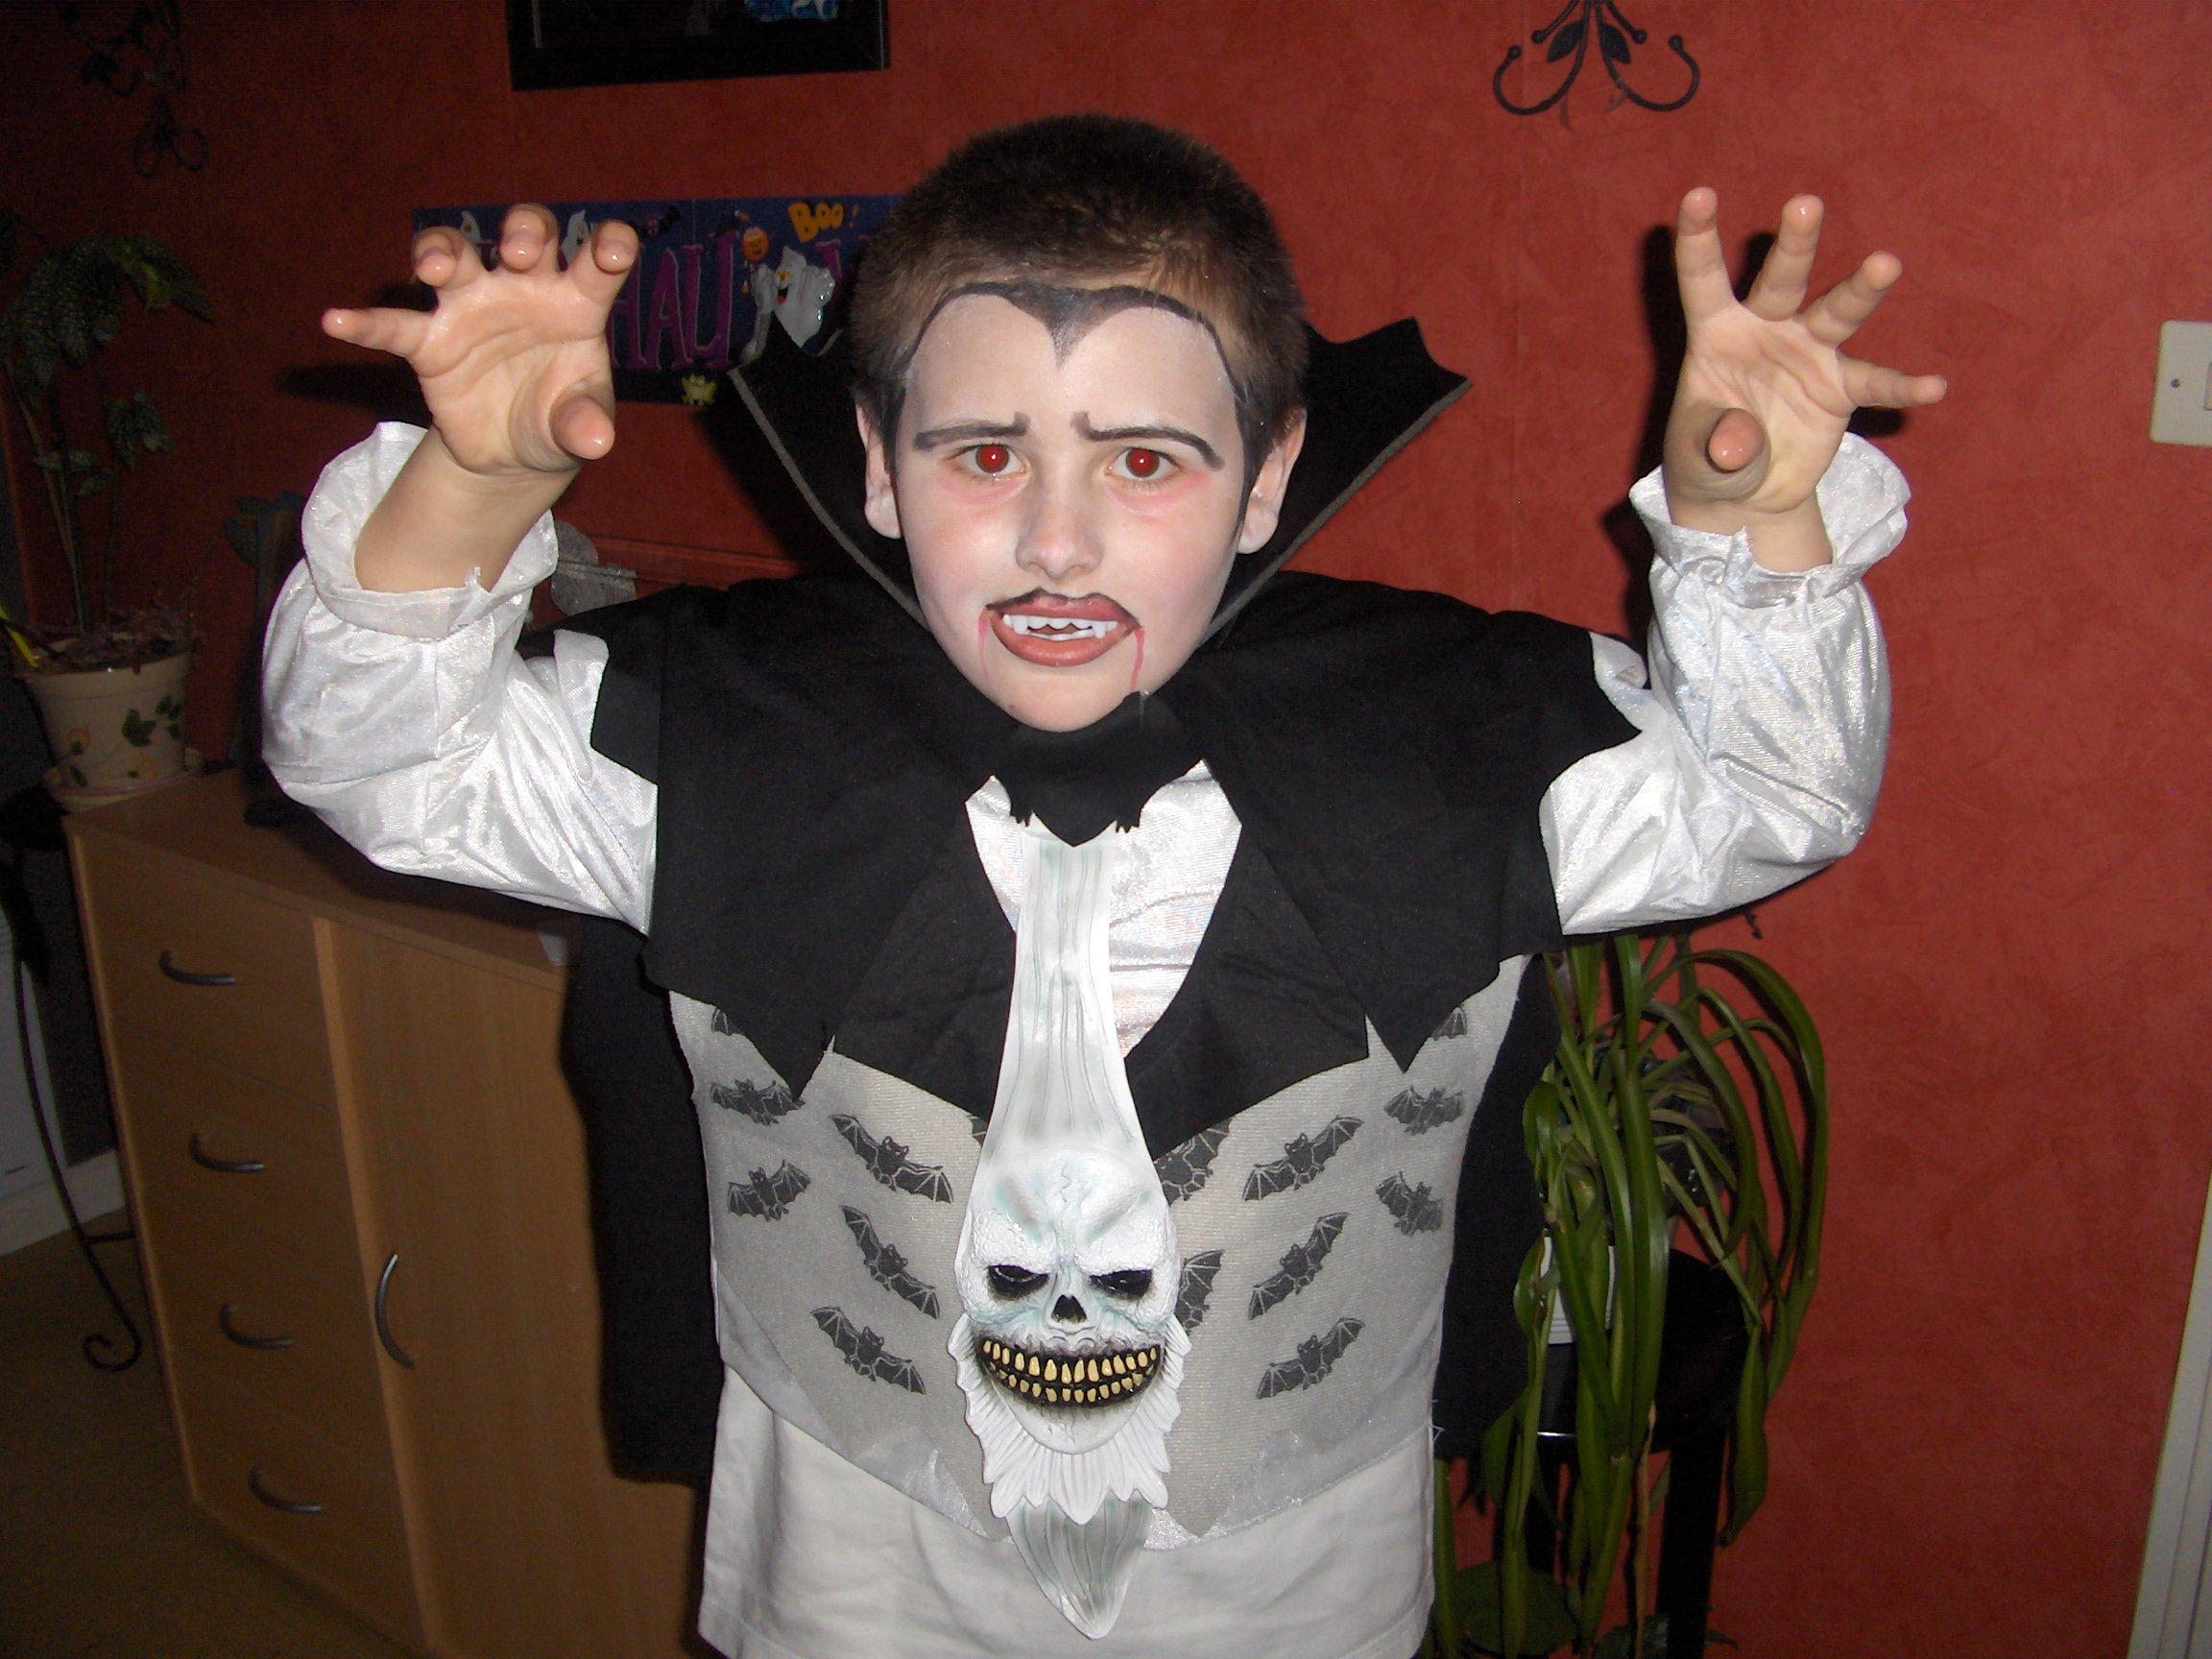 Tinky brode maquillage enfant - Maquillage vampire enfant ...